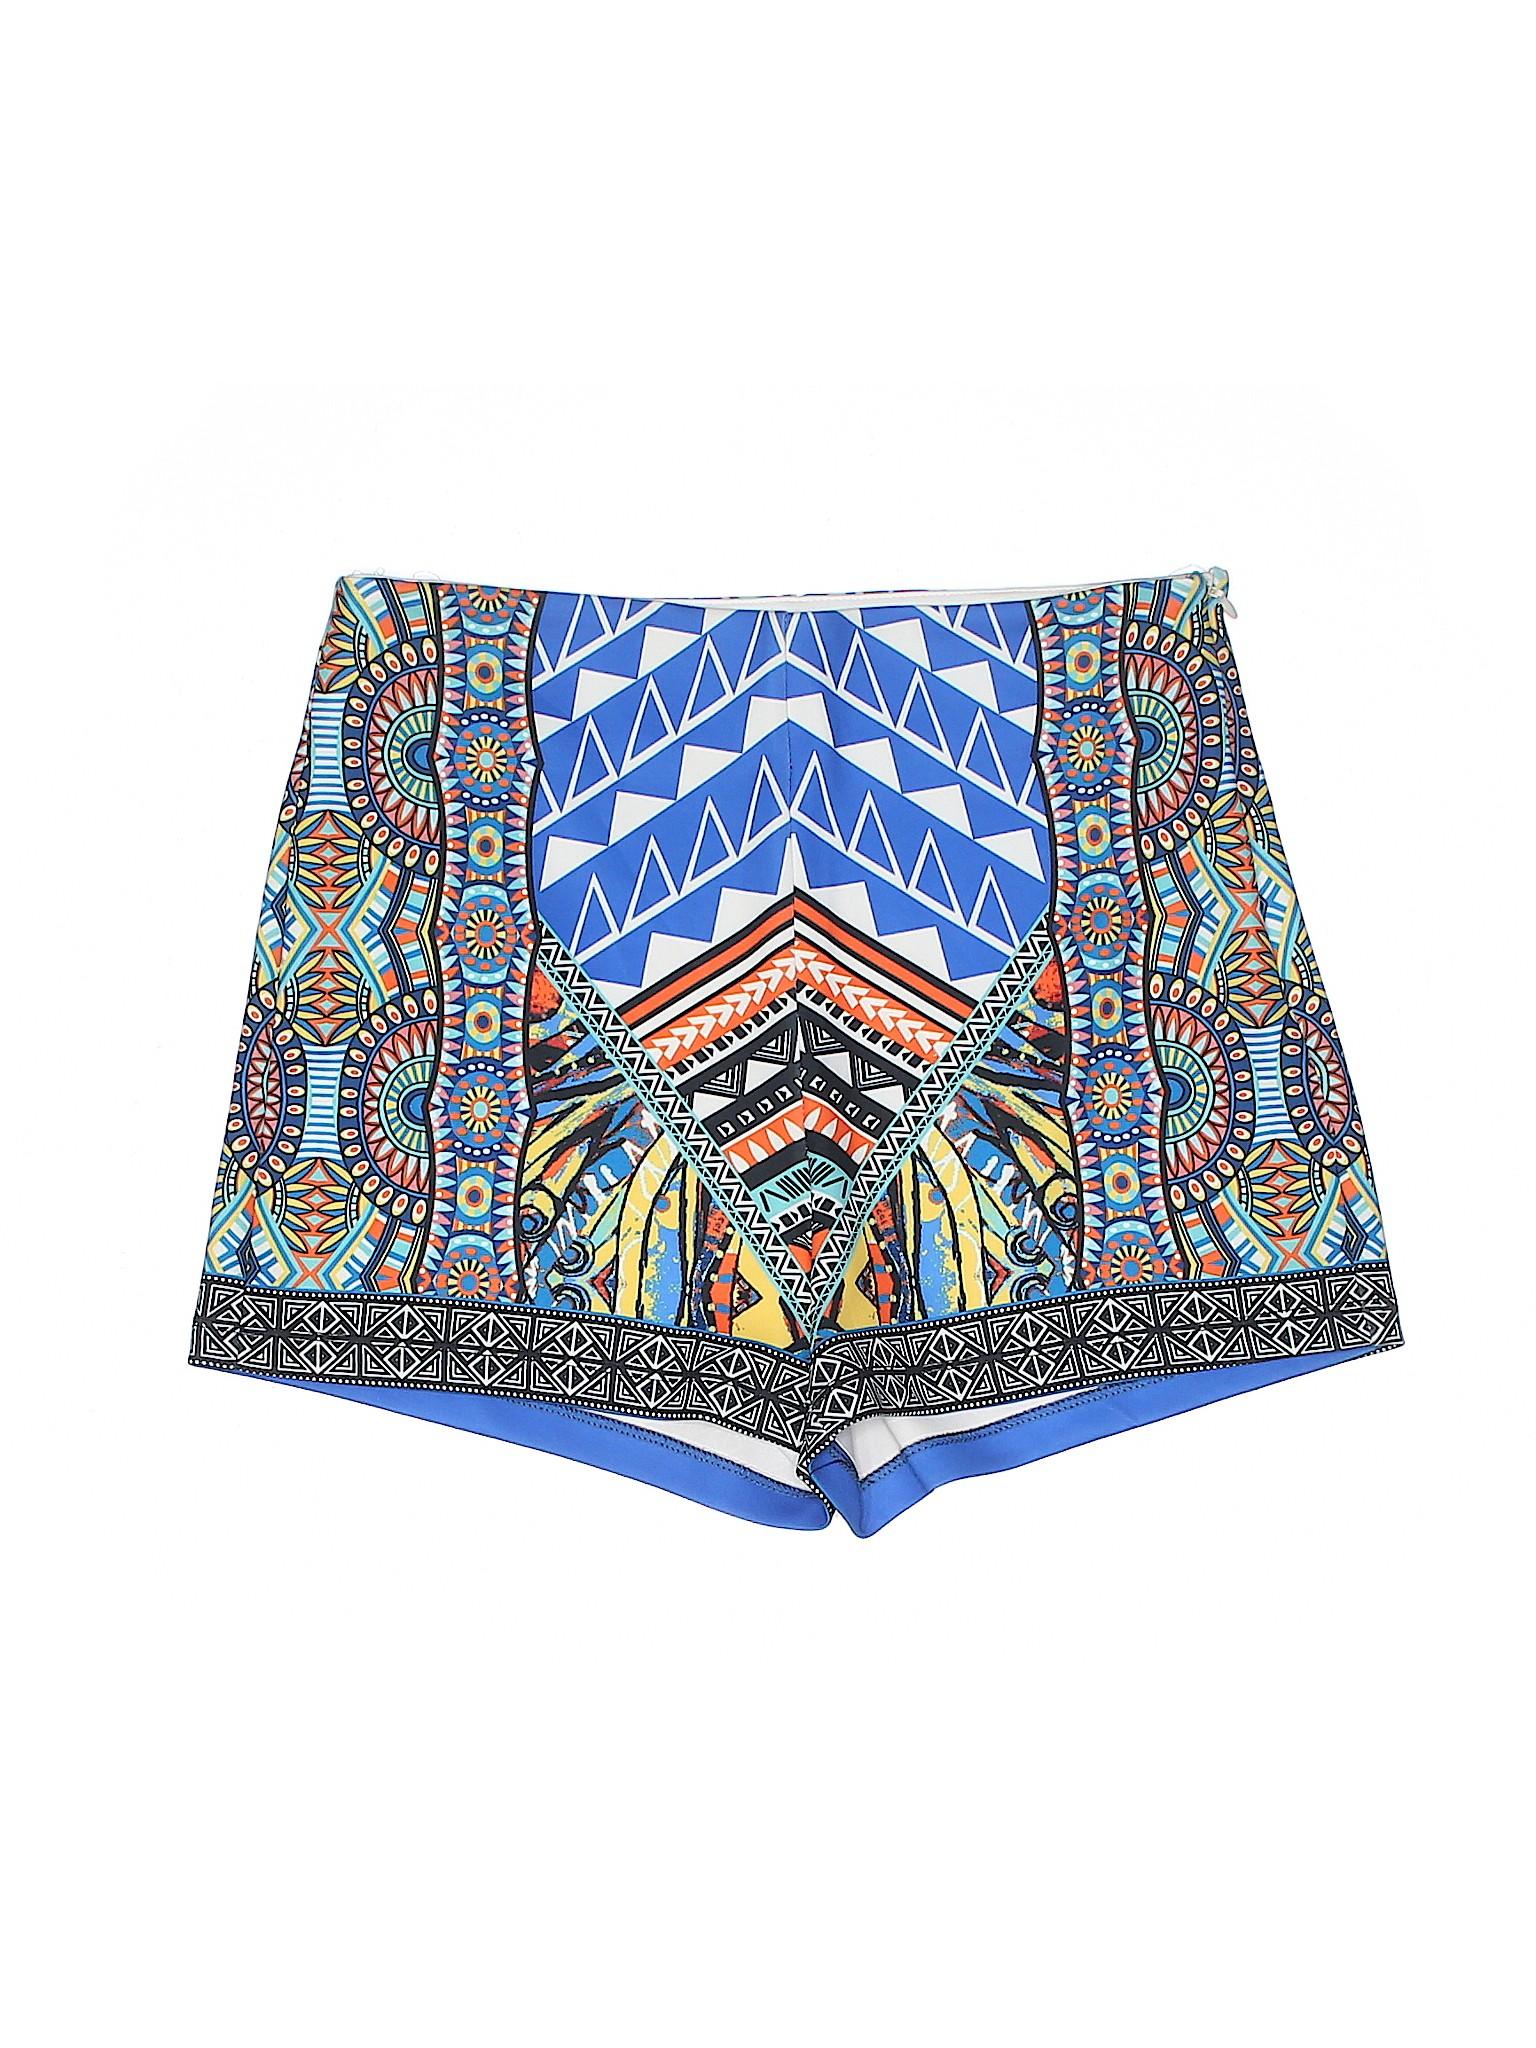 Darah Dressy Dahl Darah Dressy Boutique Boutique Darah Dahl Shorts Shorts Boutique wPp7xqF